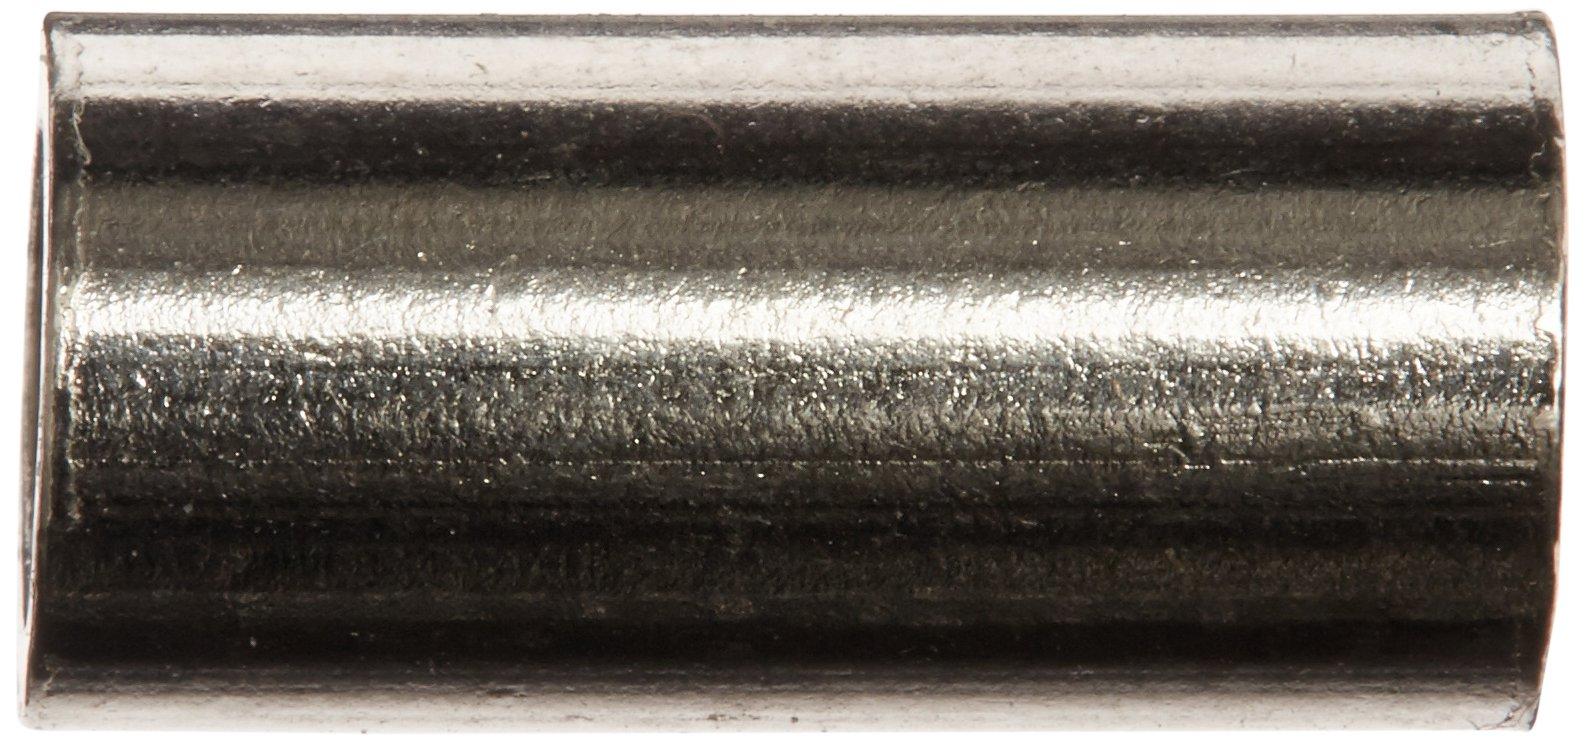 American Fishing Wire Single Barrel Crimp Sleeves Size 0 Black Color 0.025